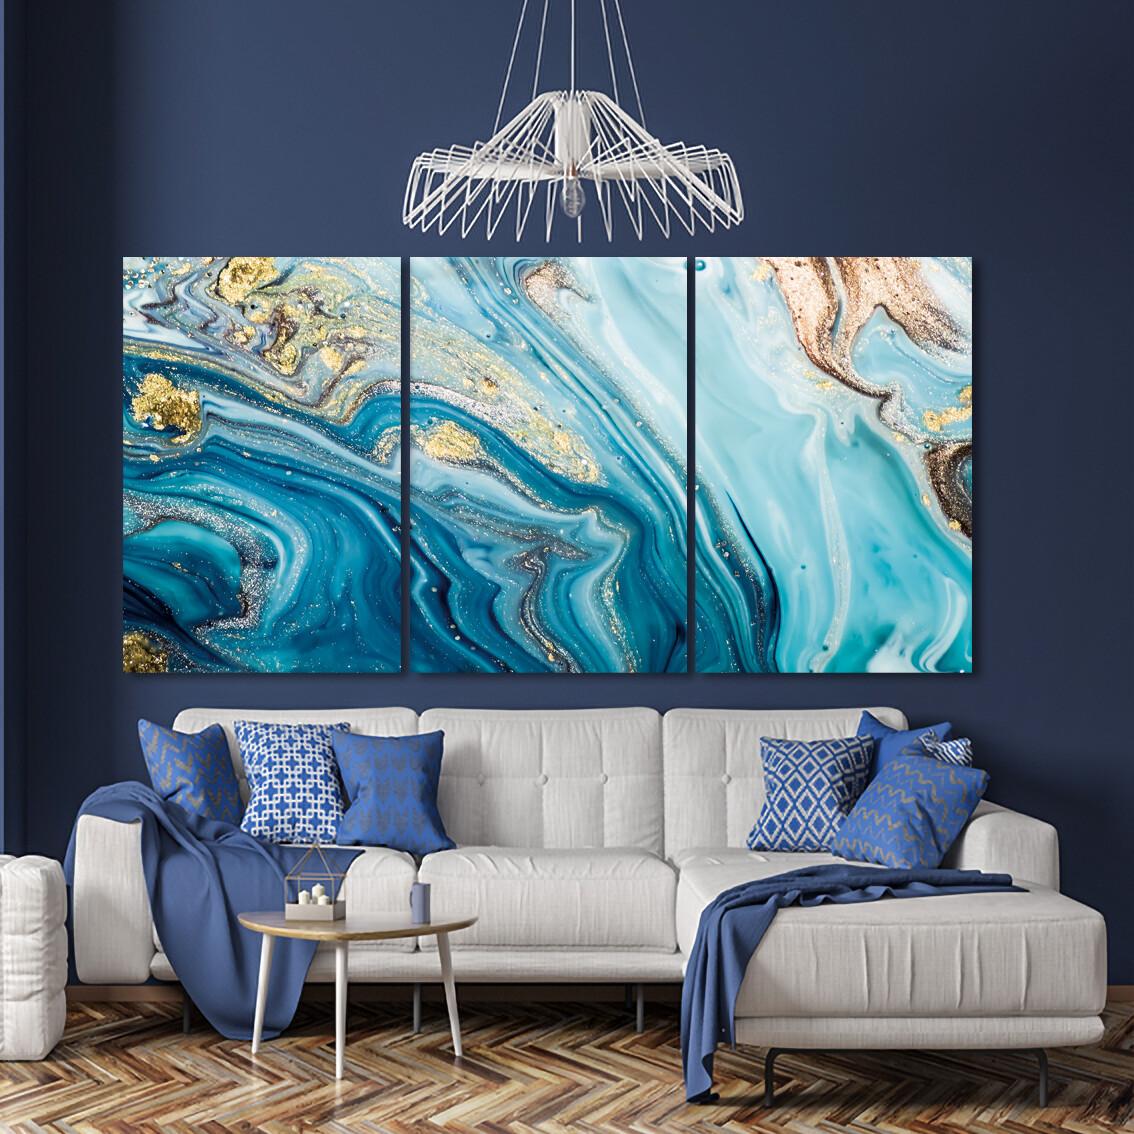 Fluid Art Blue And Gold